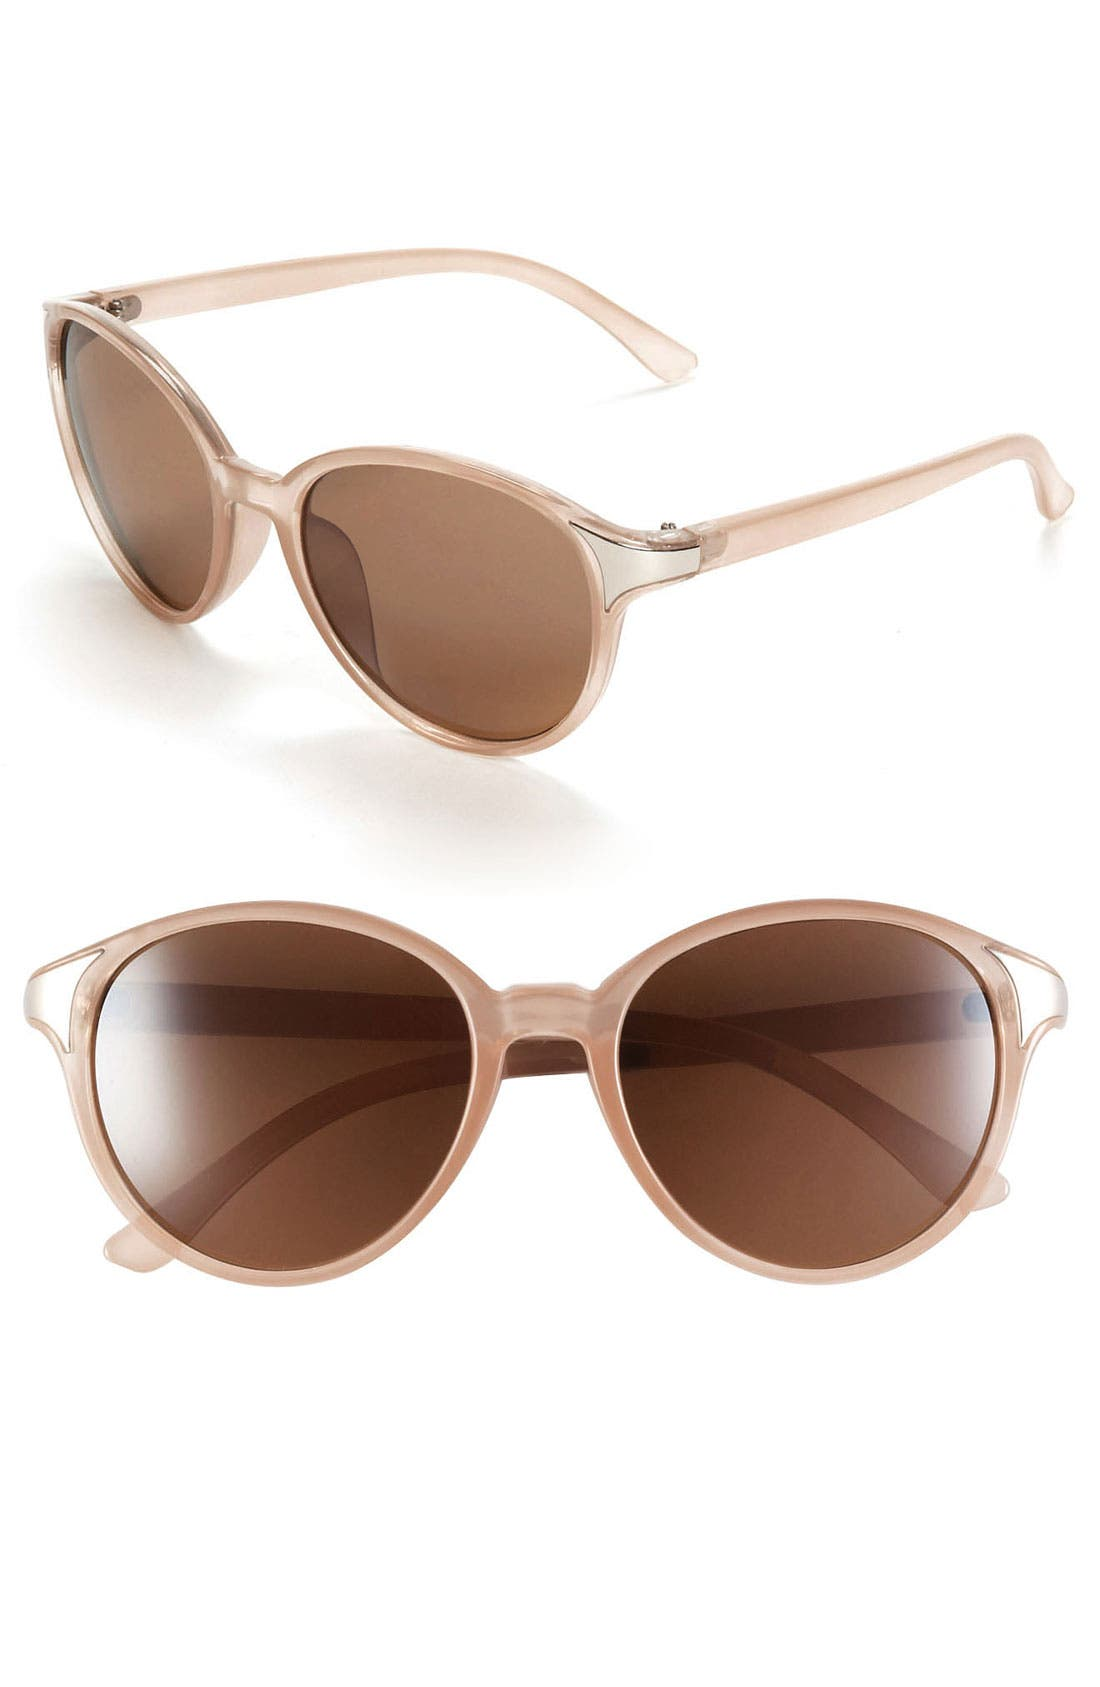 Alternate Image 1 Selected - FE NY 'High Life' Sunglasses